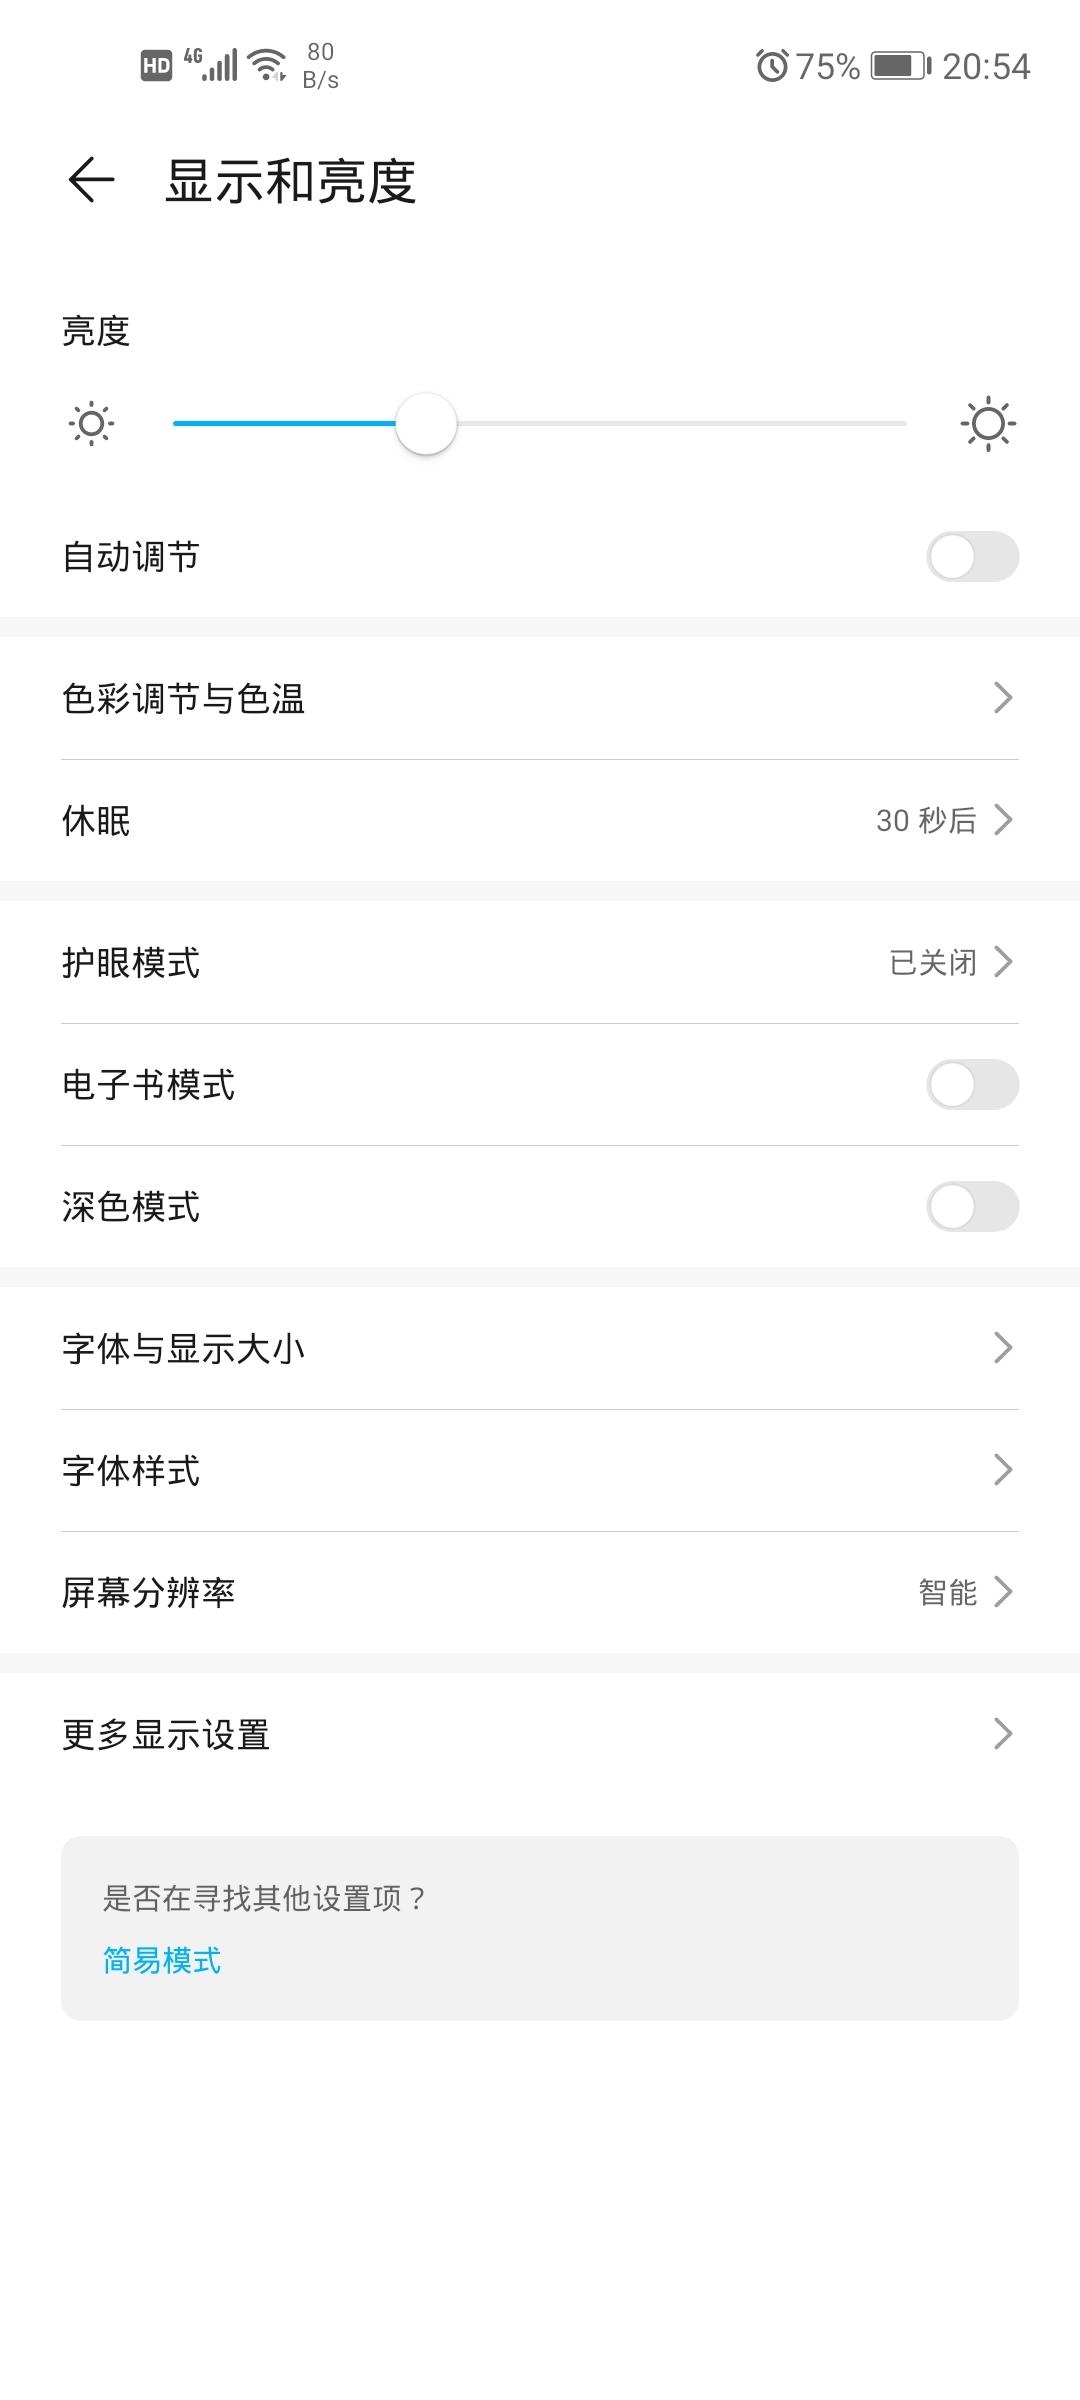 Screenshot_20200507_205452_com.android.settings.jpg